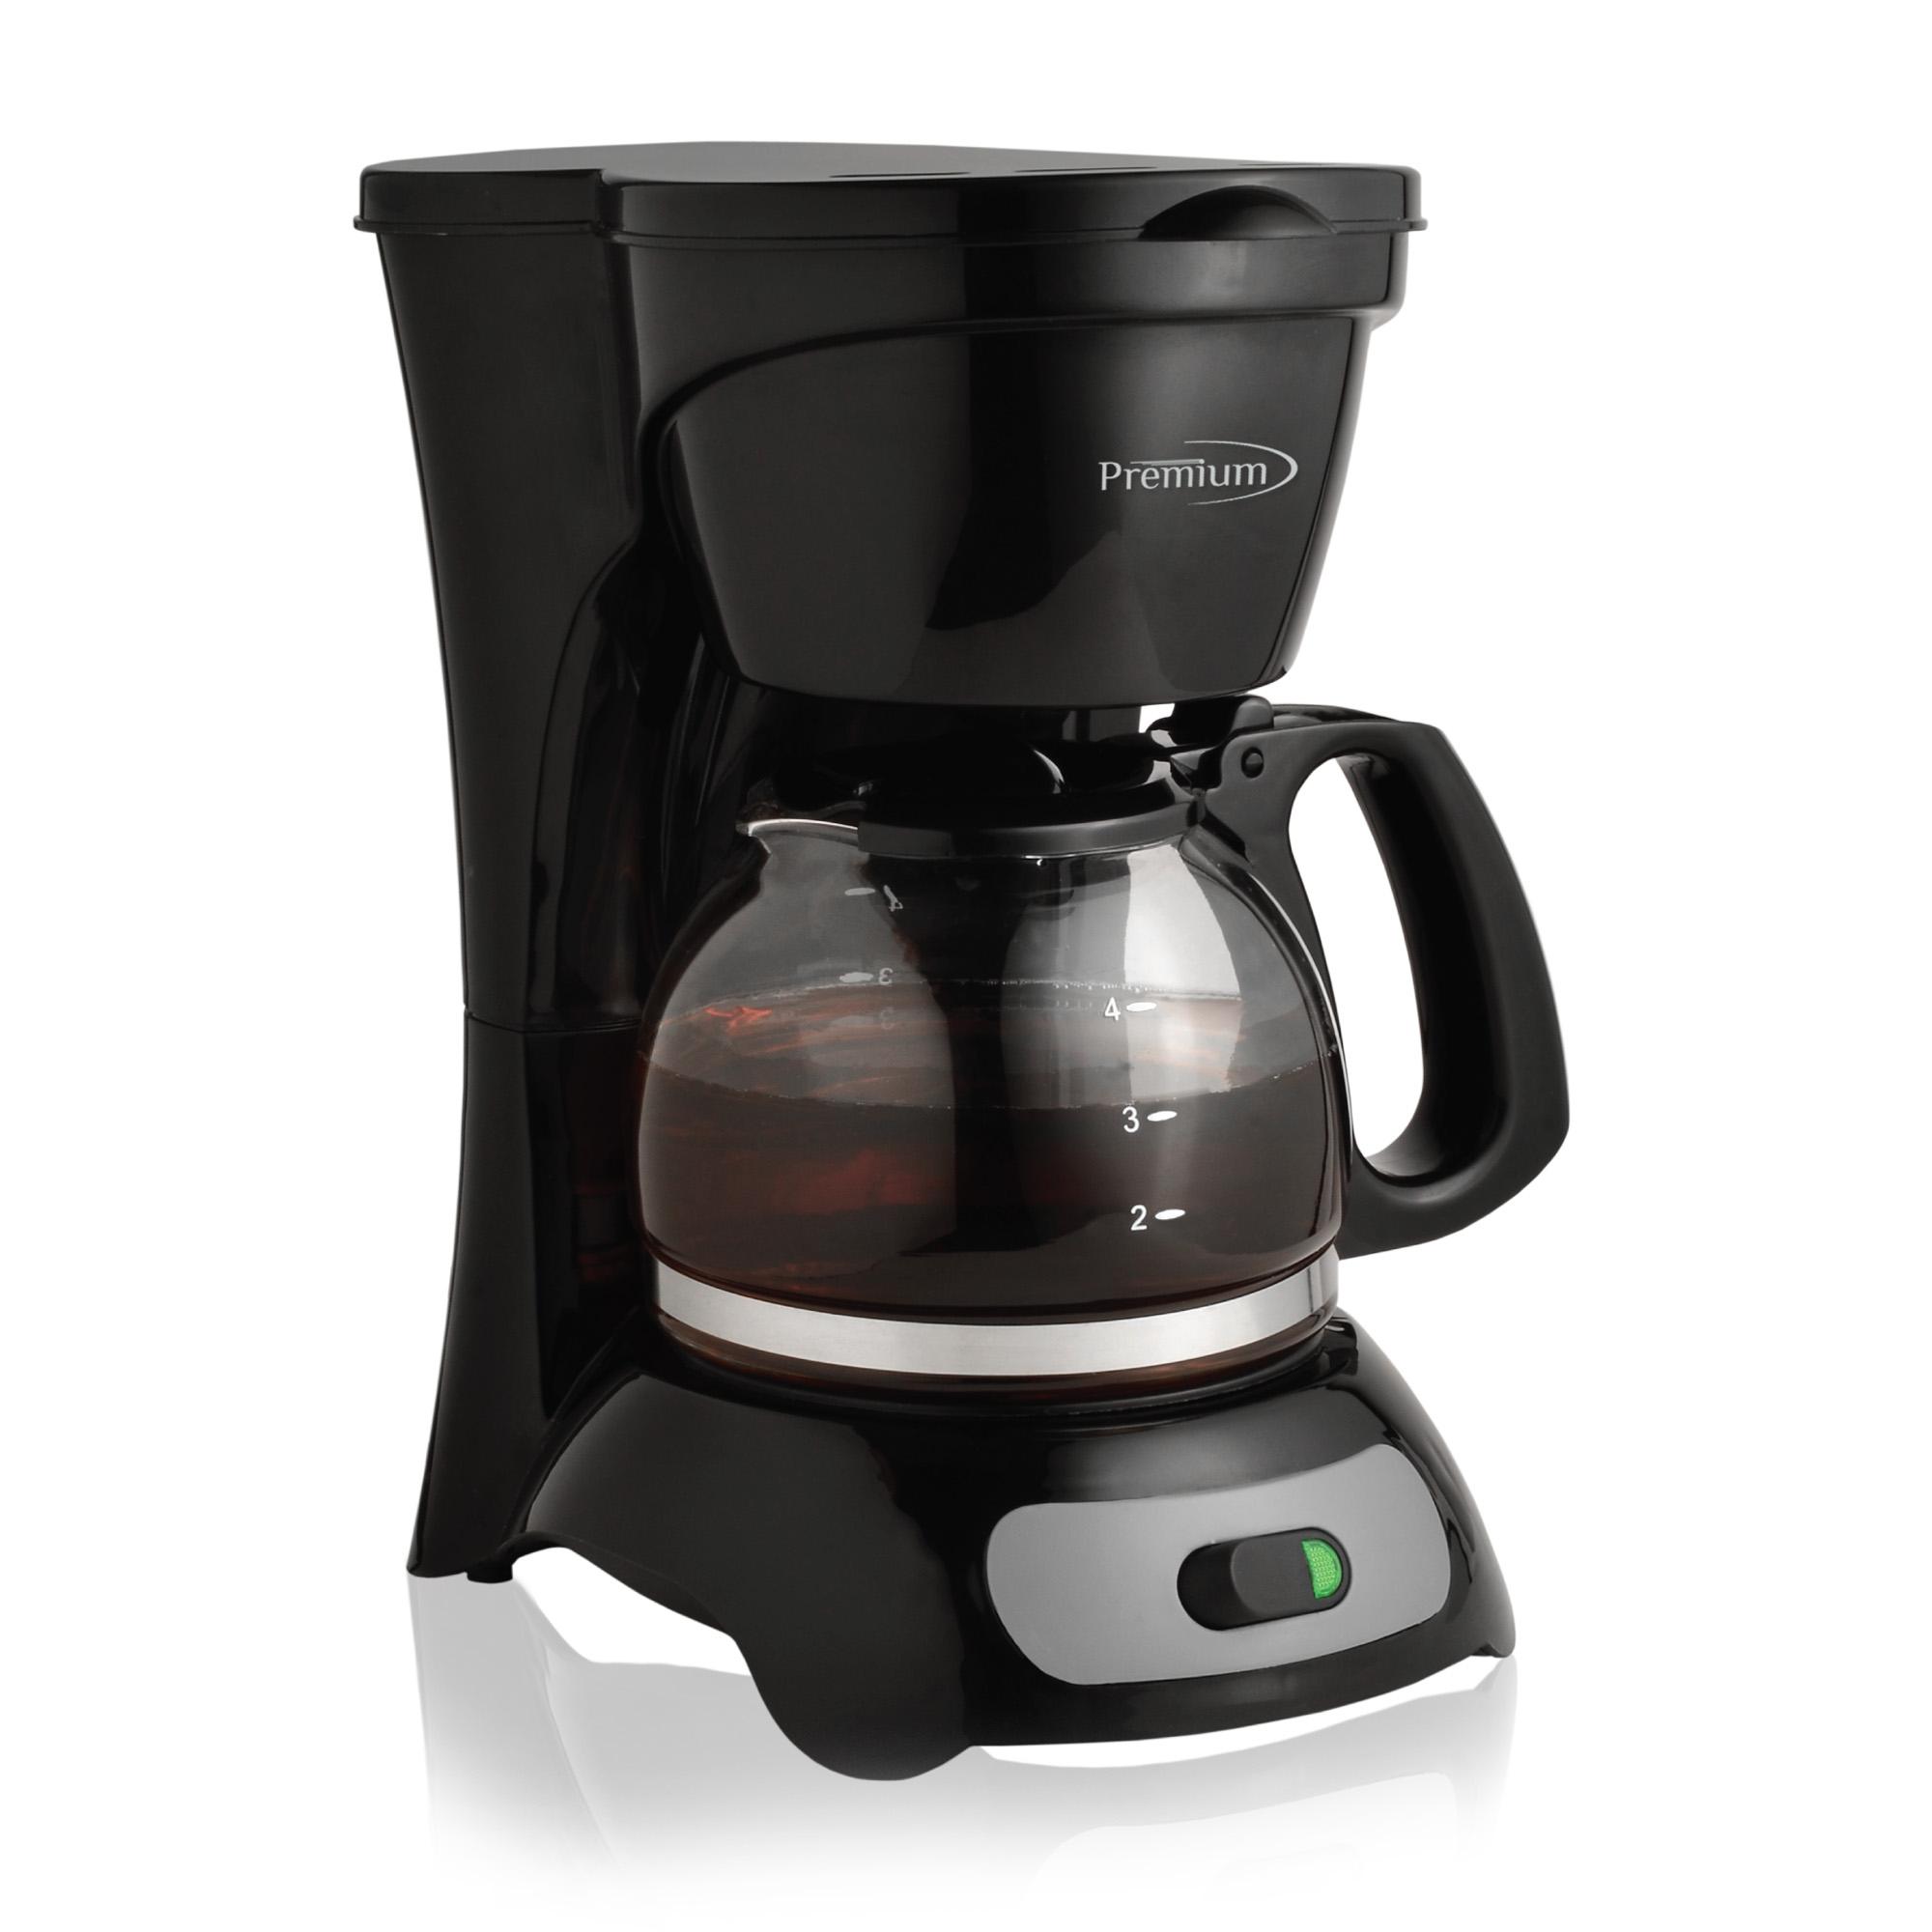 Small Coffee Maker Flipkart : Premium Appliances - Coffee Maker 4 Cups